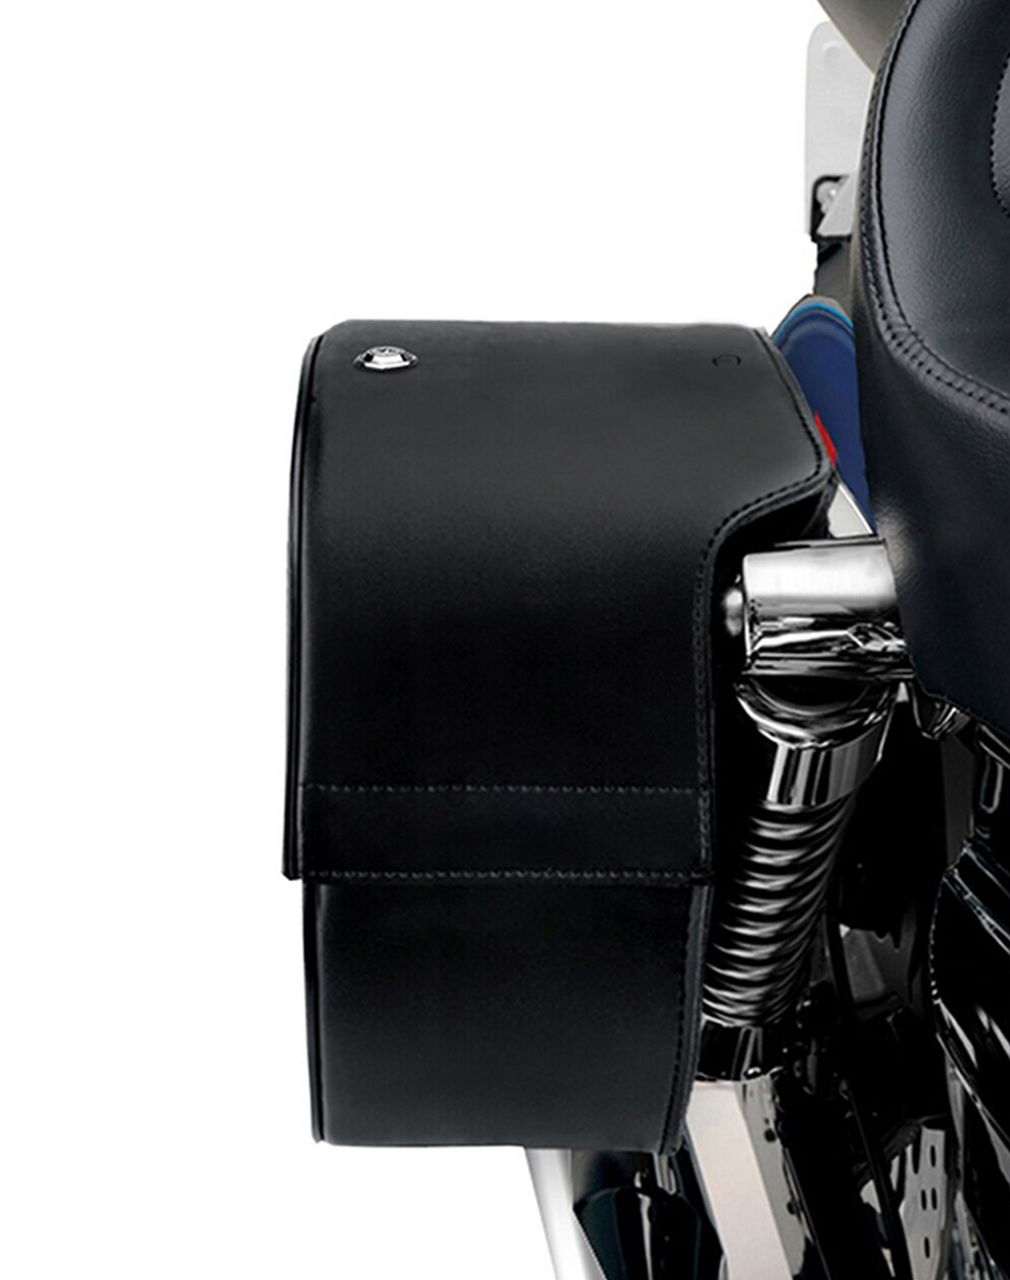 Kawasaki Vulcan 1500 Classic Shock Cutout Slanted Large Motorcycle Saddlebags Shock Cutout View